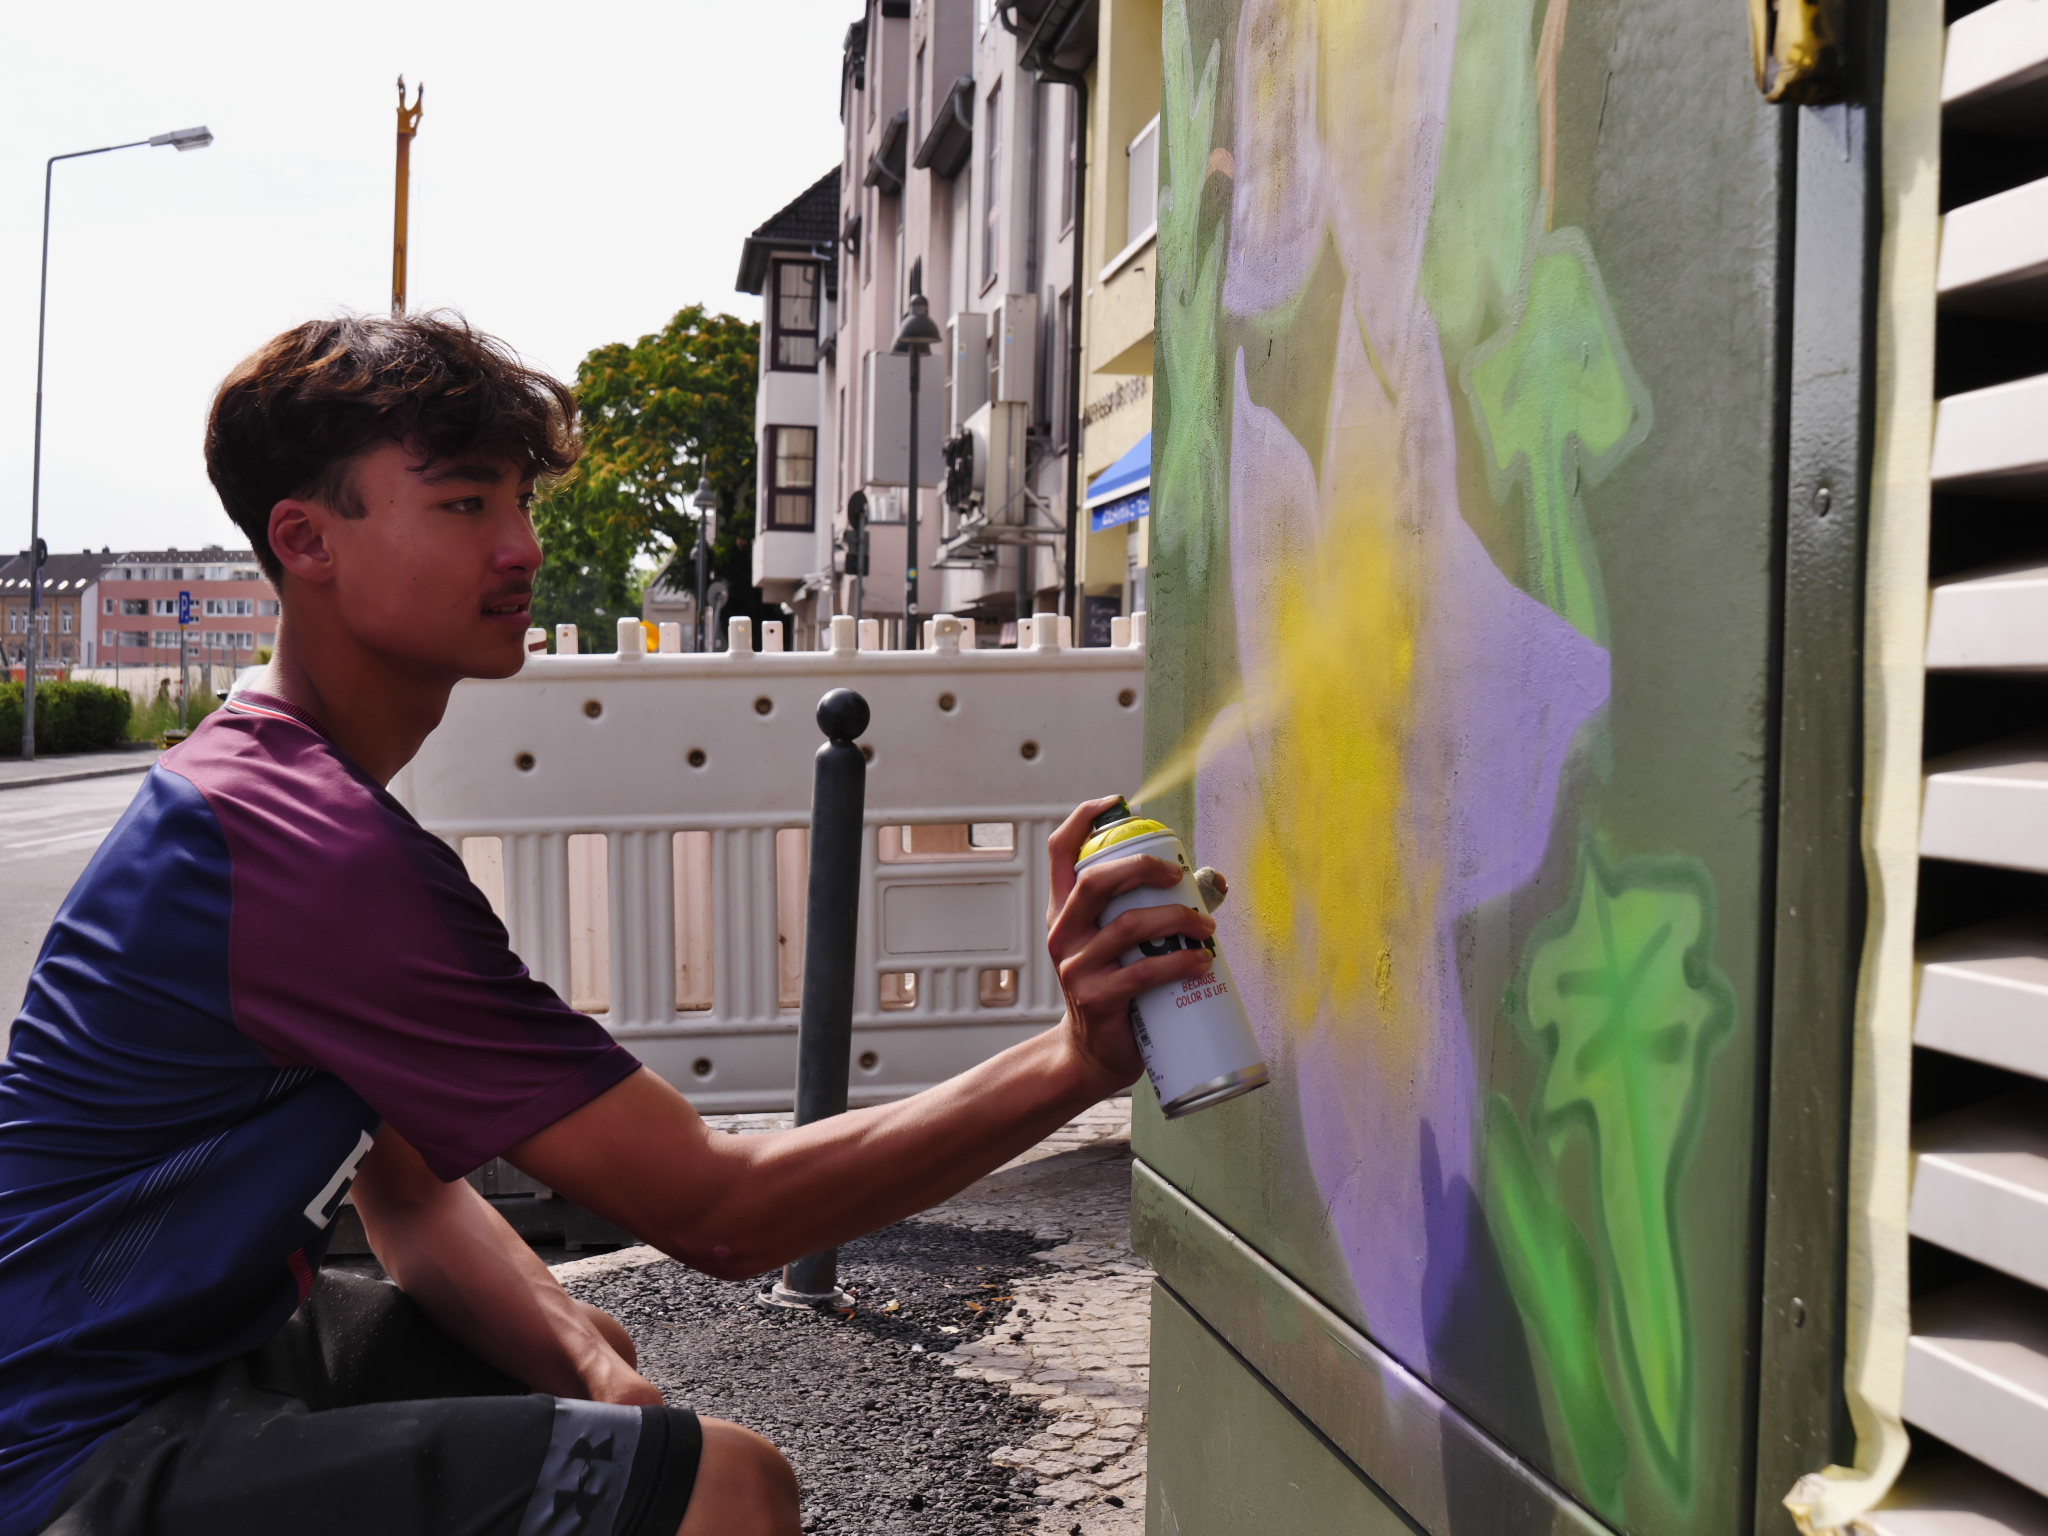 jugendkulturjahr-2020-ratingen-jkj2020-graffiti-trafohaeuschen-stadtwerke-Bild18